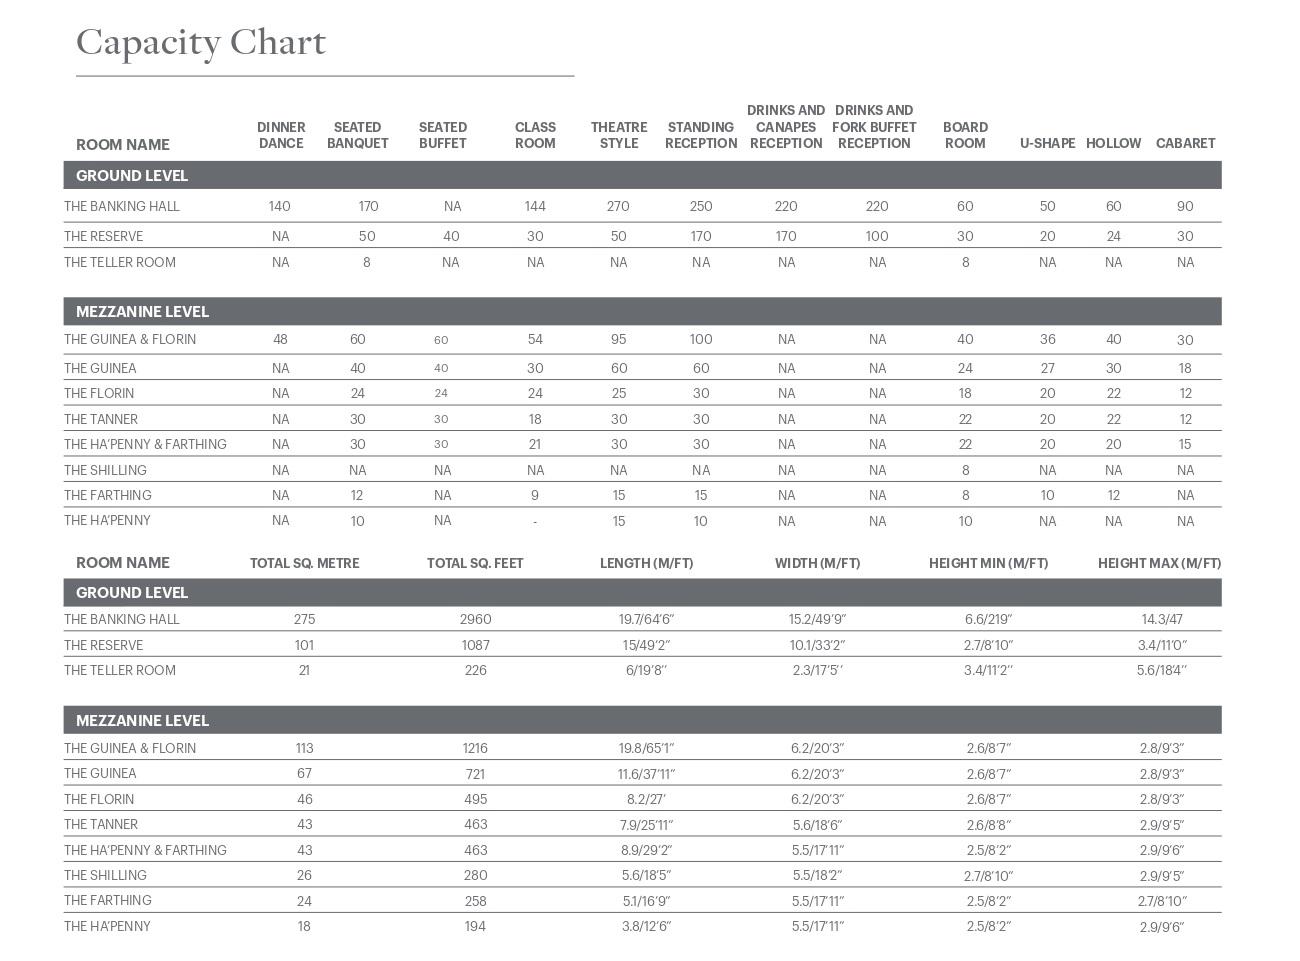 capacity chart of meeting rooms at westin dublin